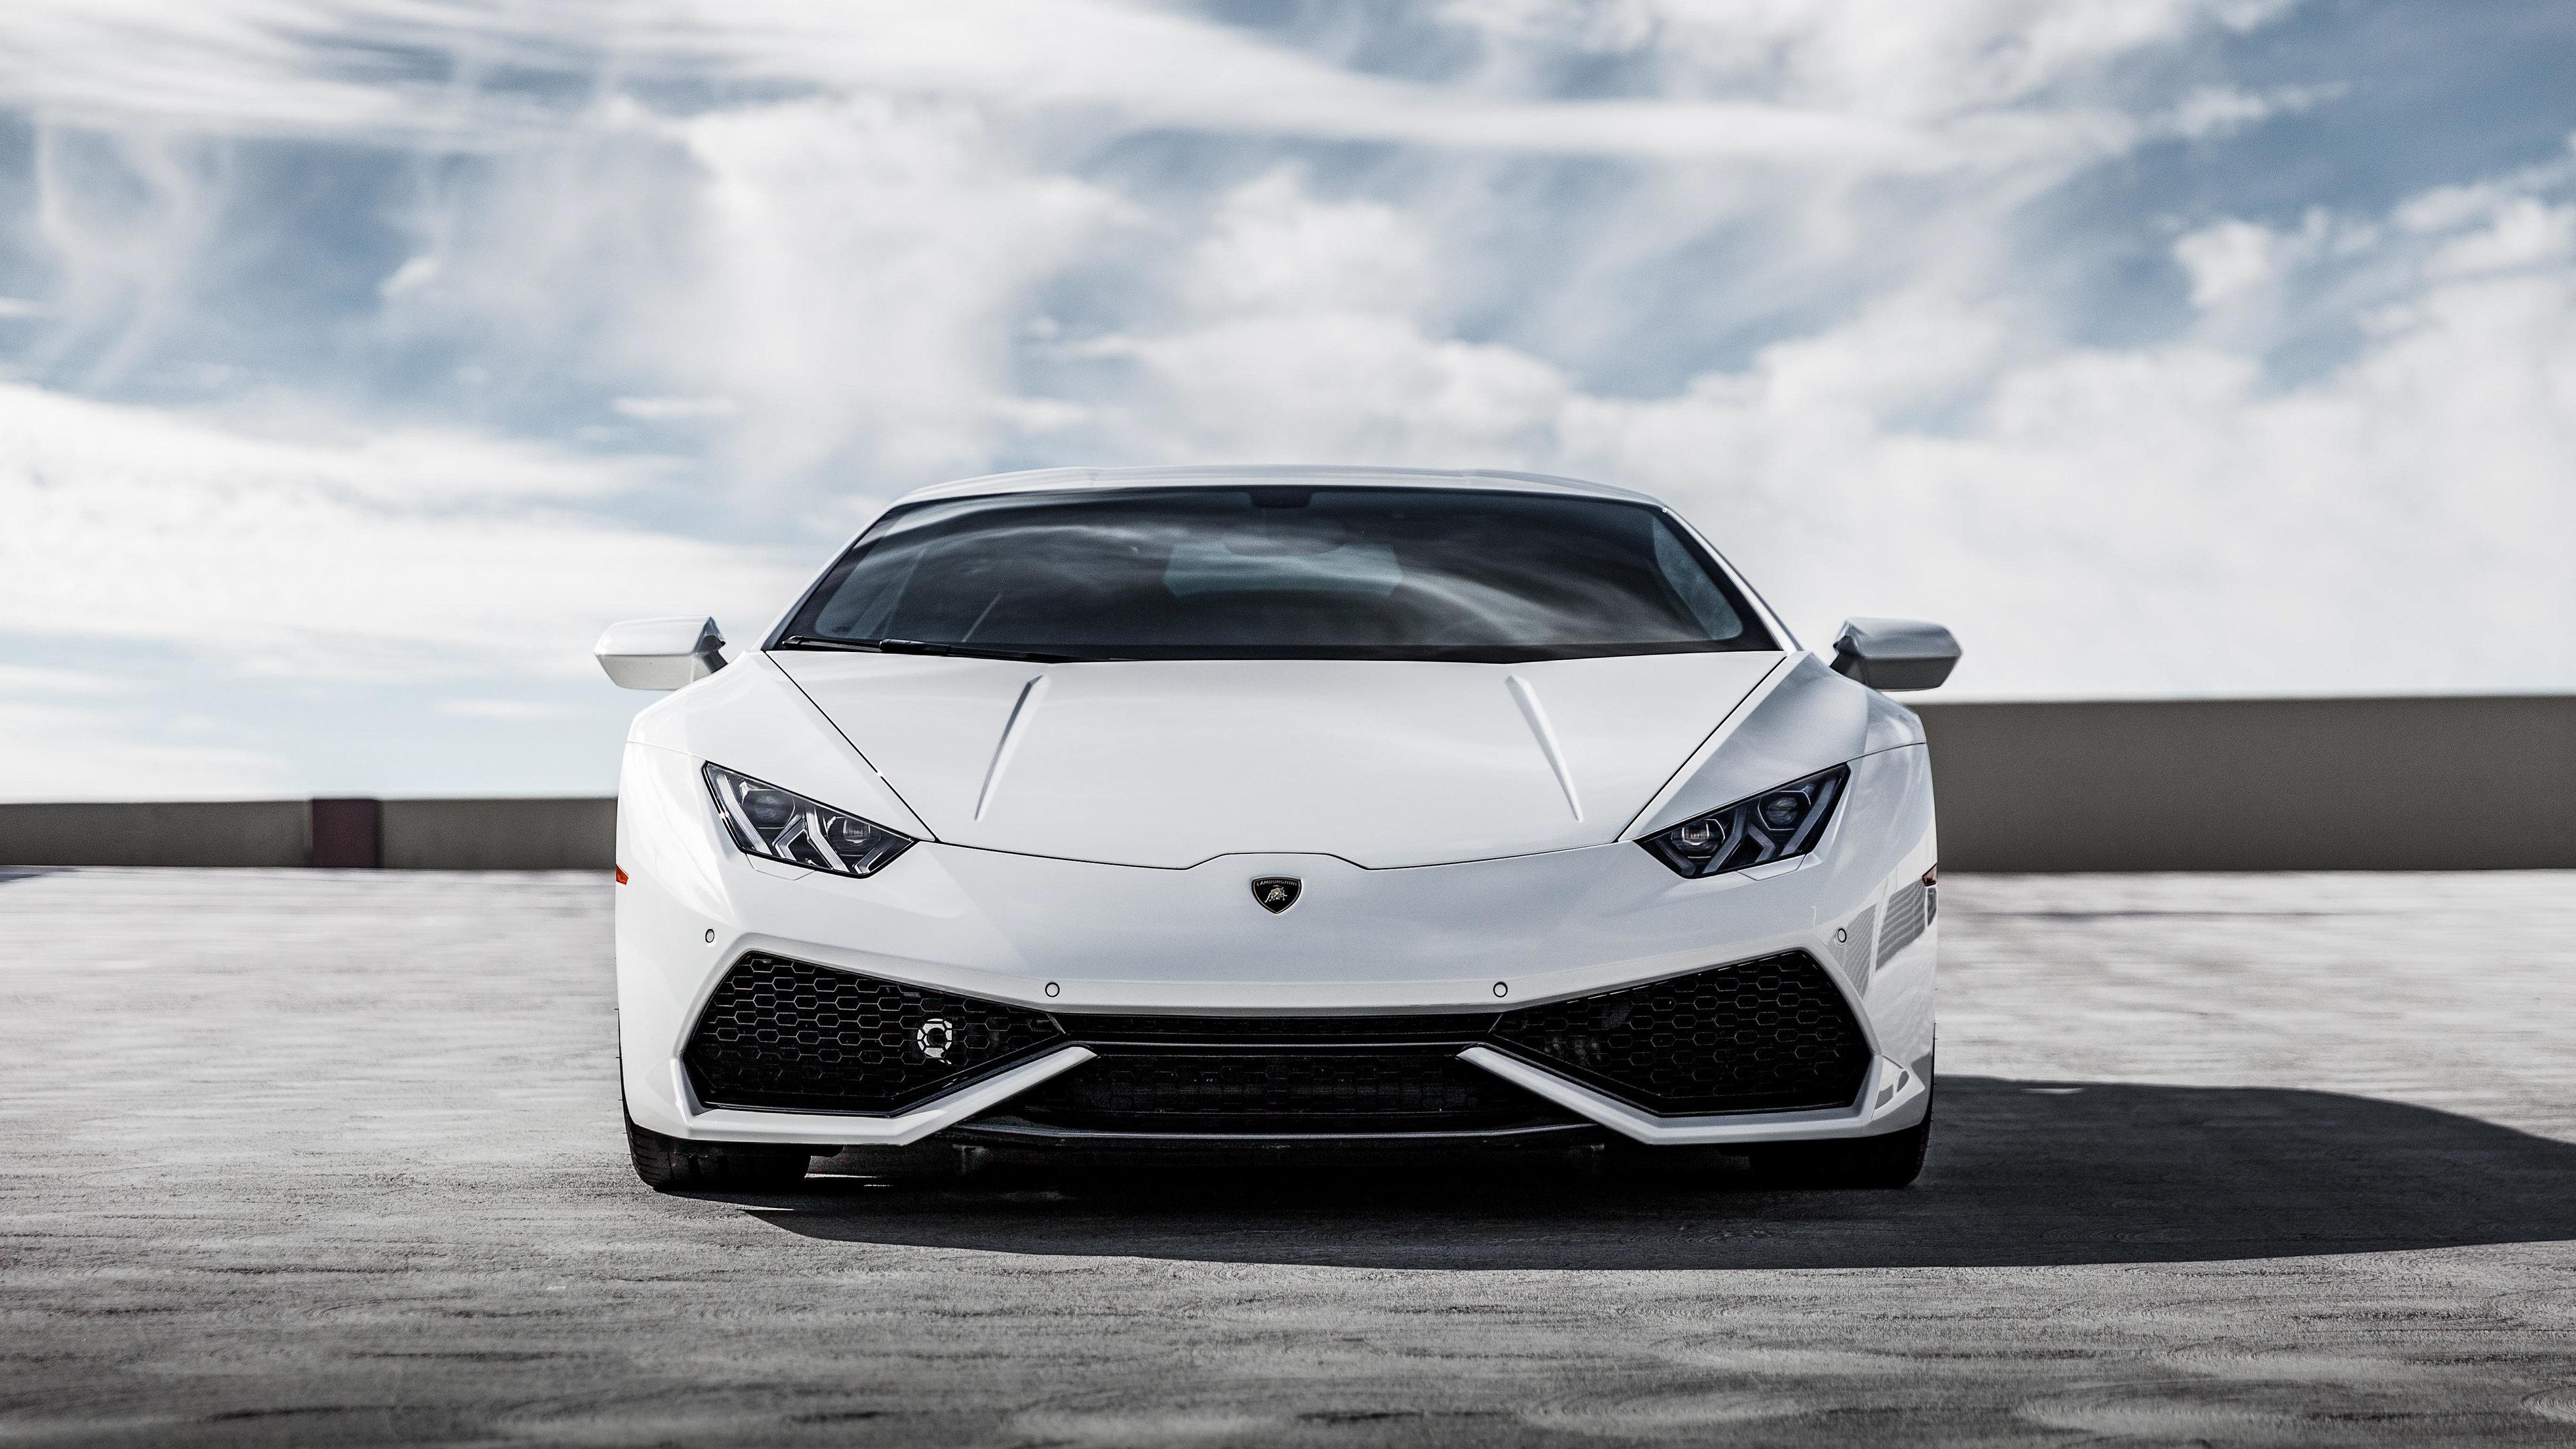 white lamborghini huracan 4k front 1546362158 - White Lamborghini Huracan 4k Front - lamborghini wallpapers, lamborghini huracan wallpapers, hd-wallpapers, cars wallpapers, 4k-wallpapers